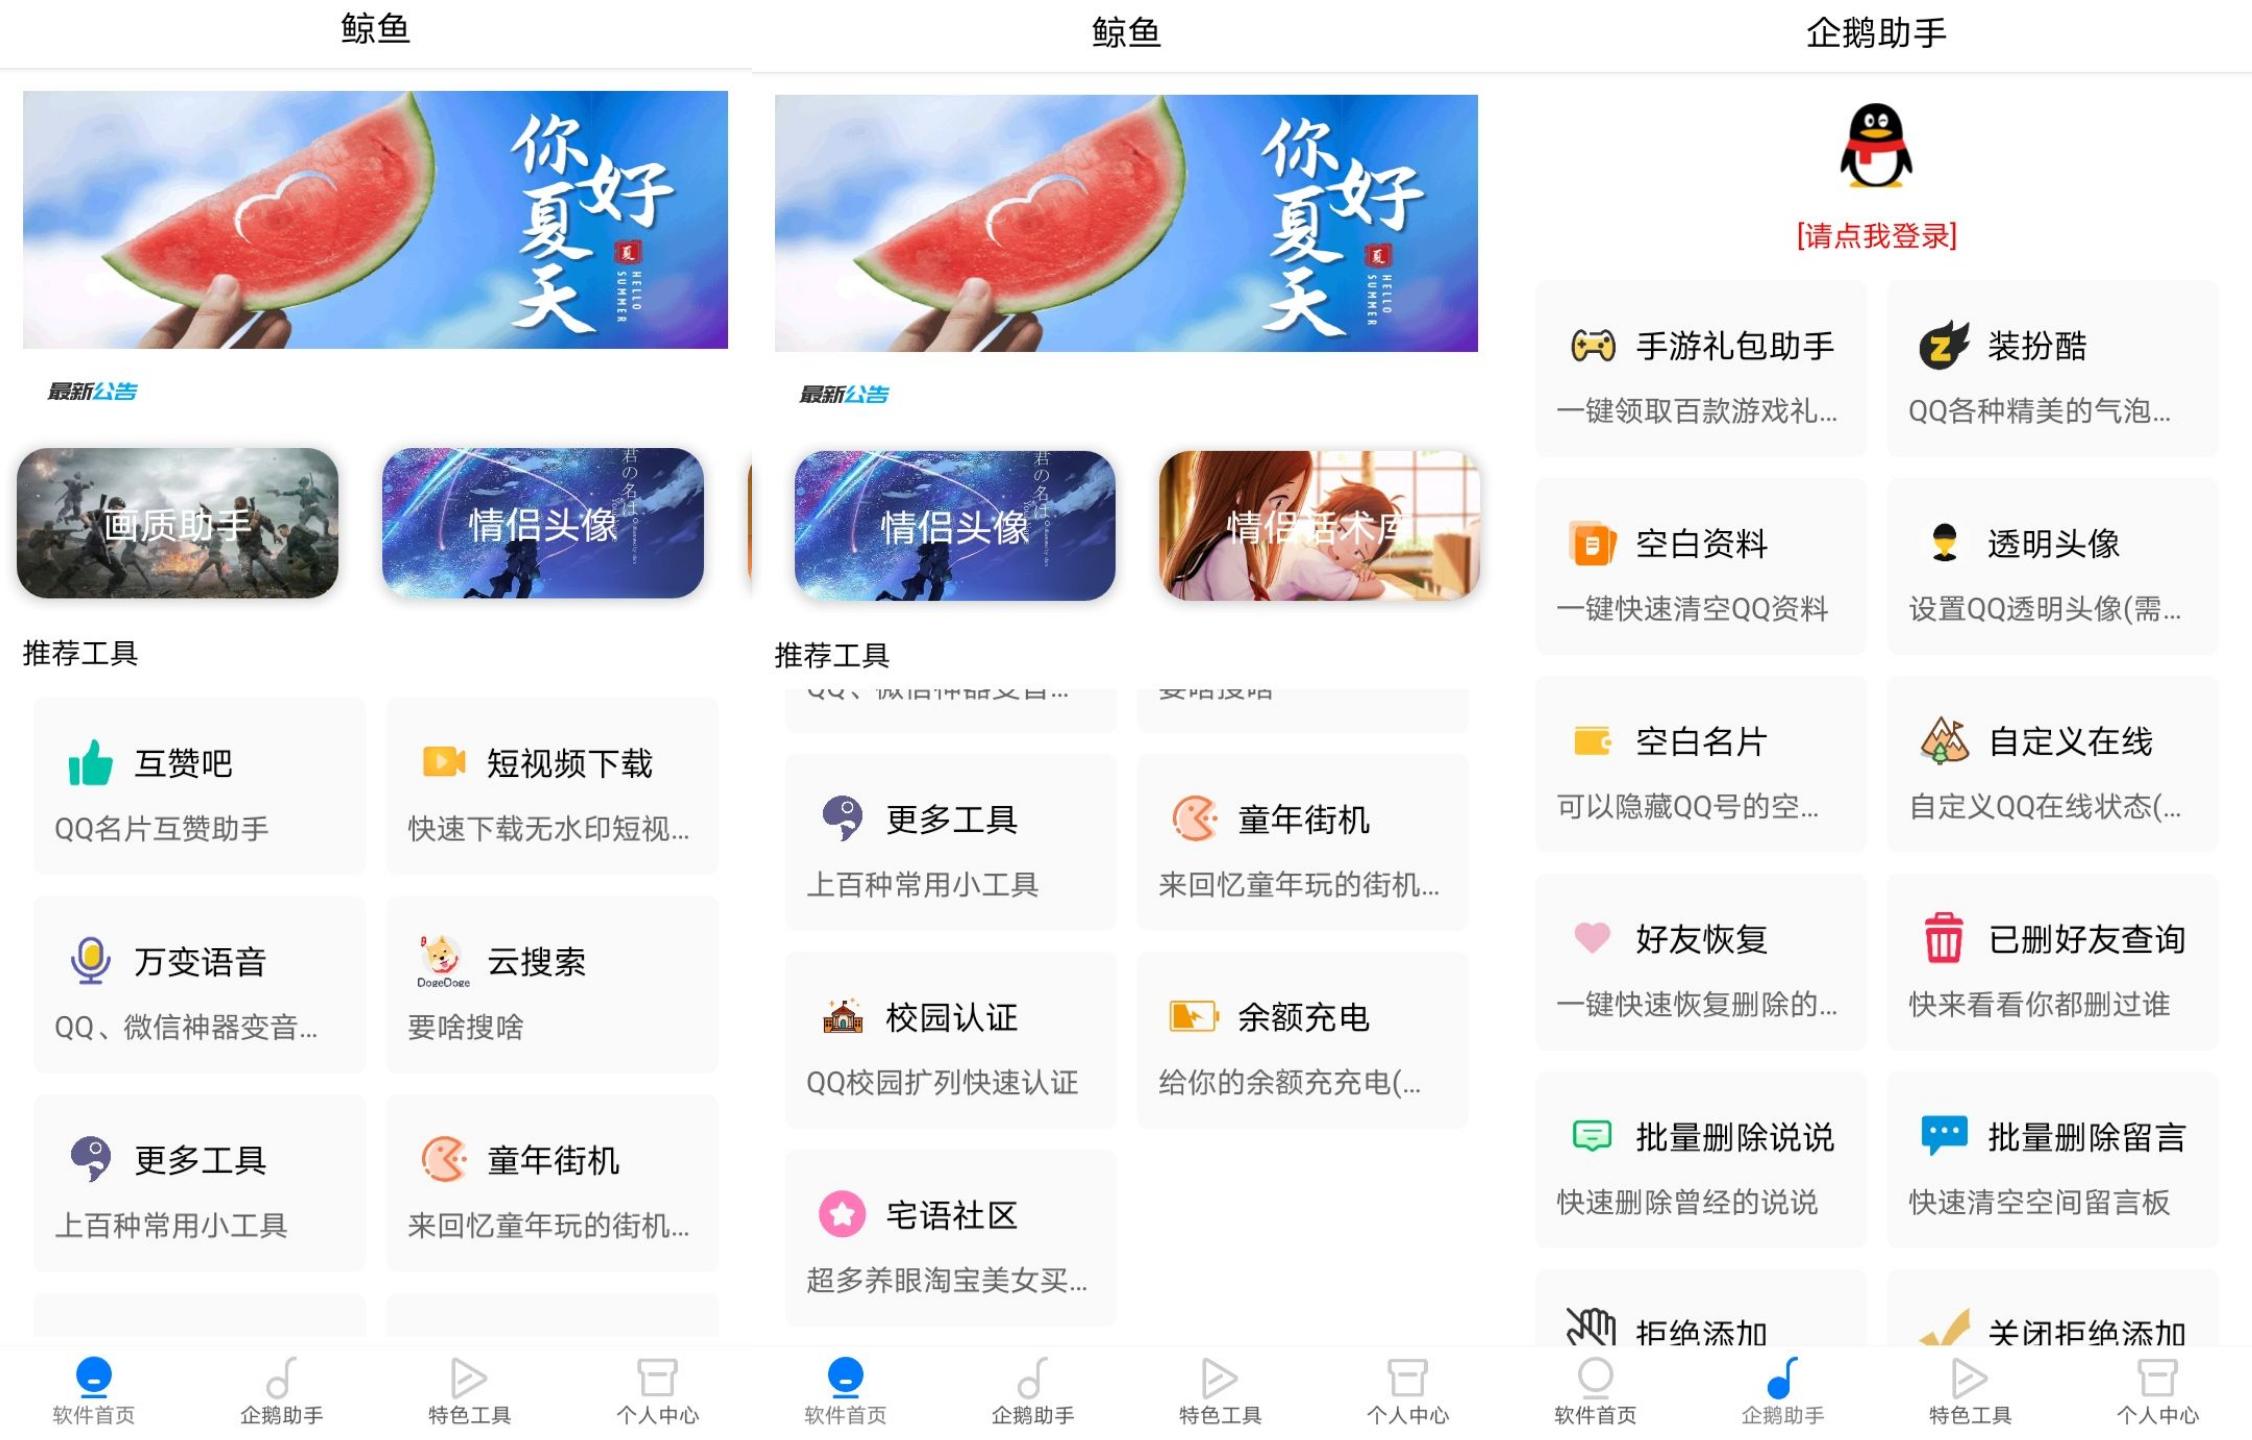 鲸鱼app